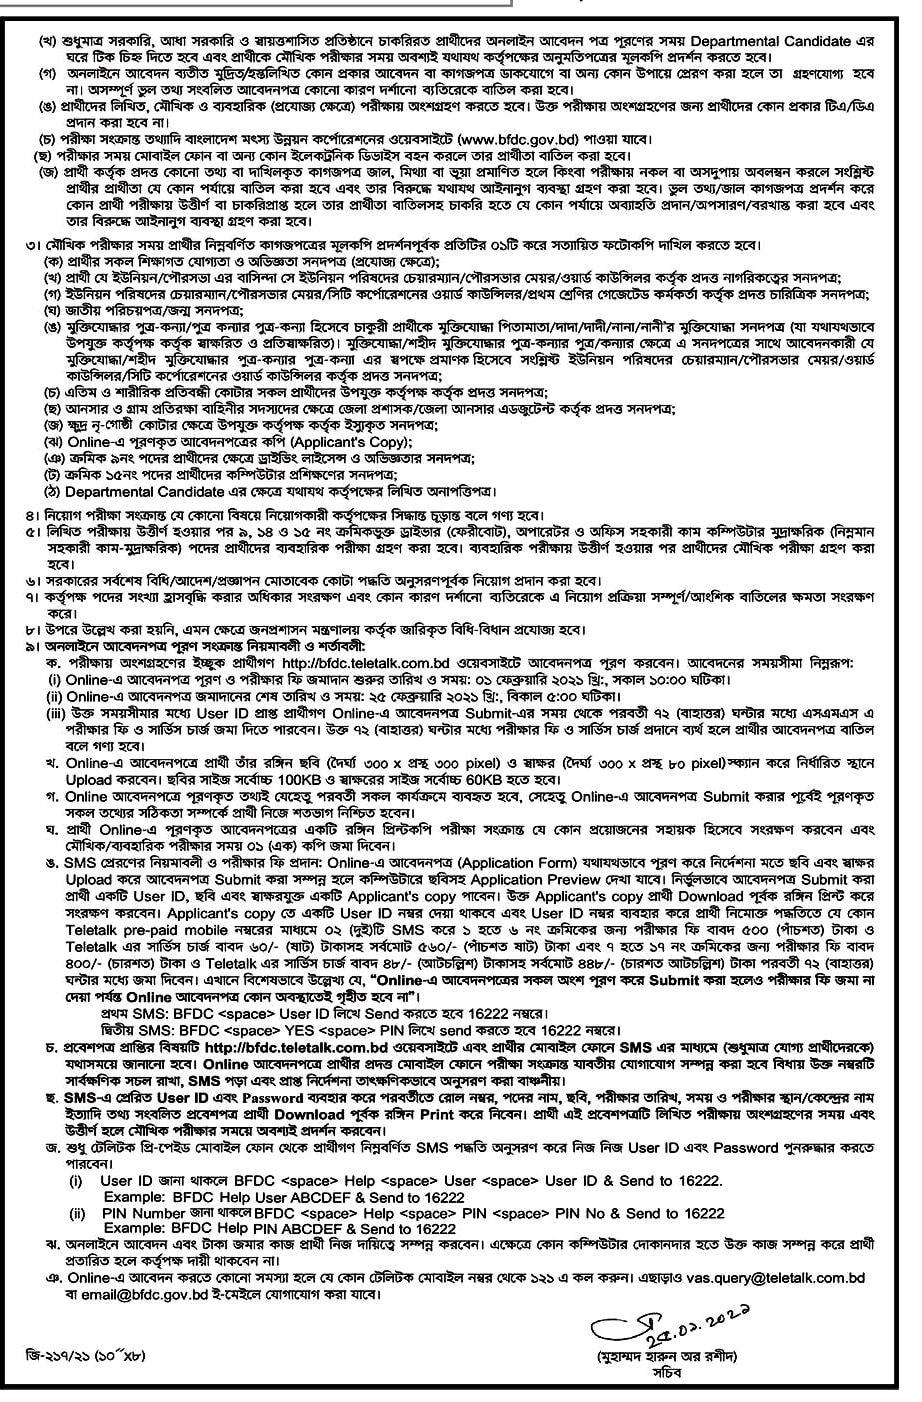 bfdc-job-circular-jobs-learninghomebd-com-2